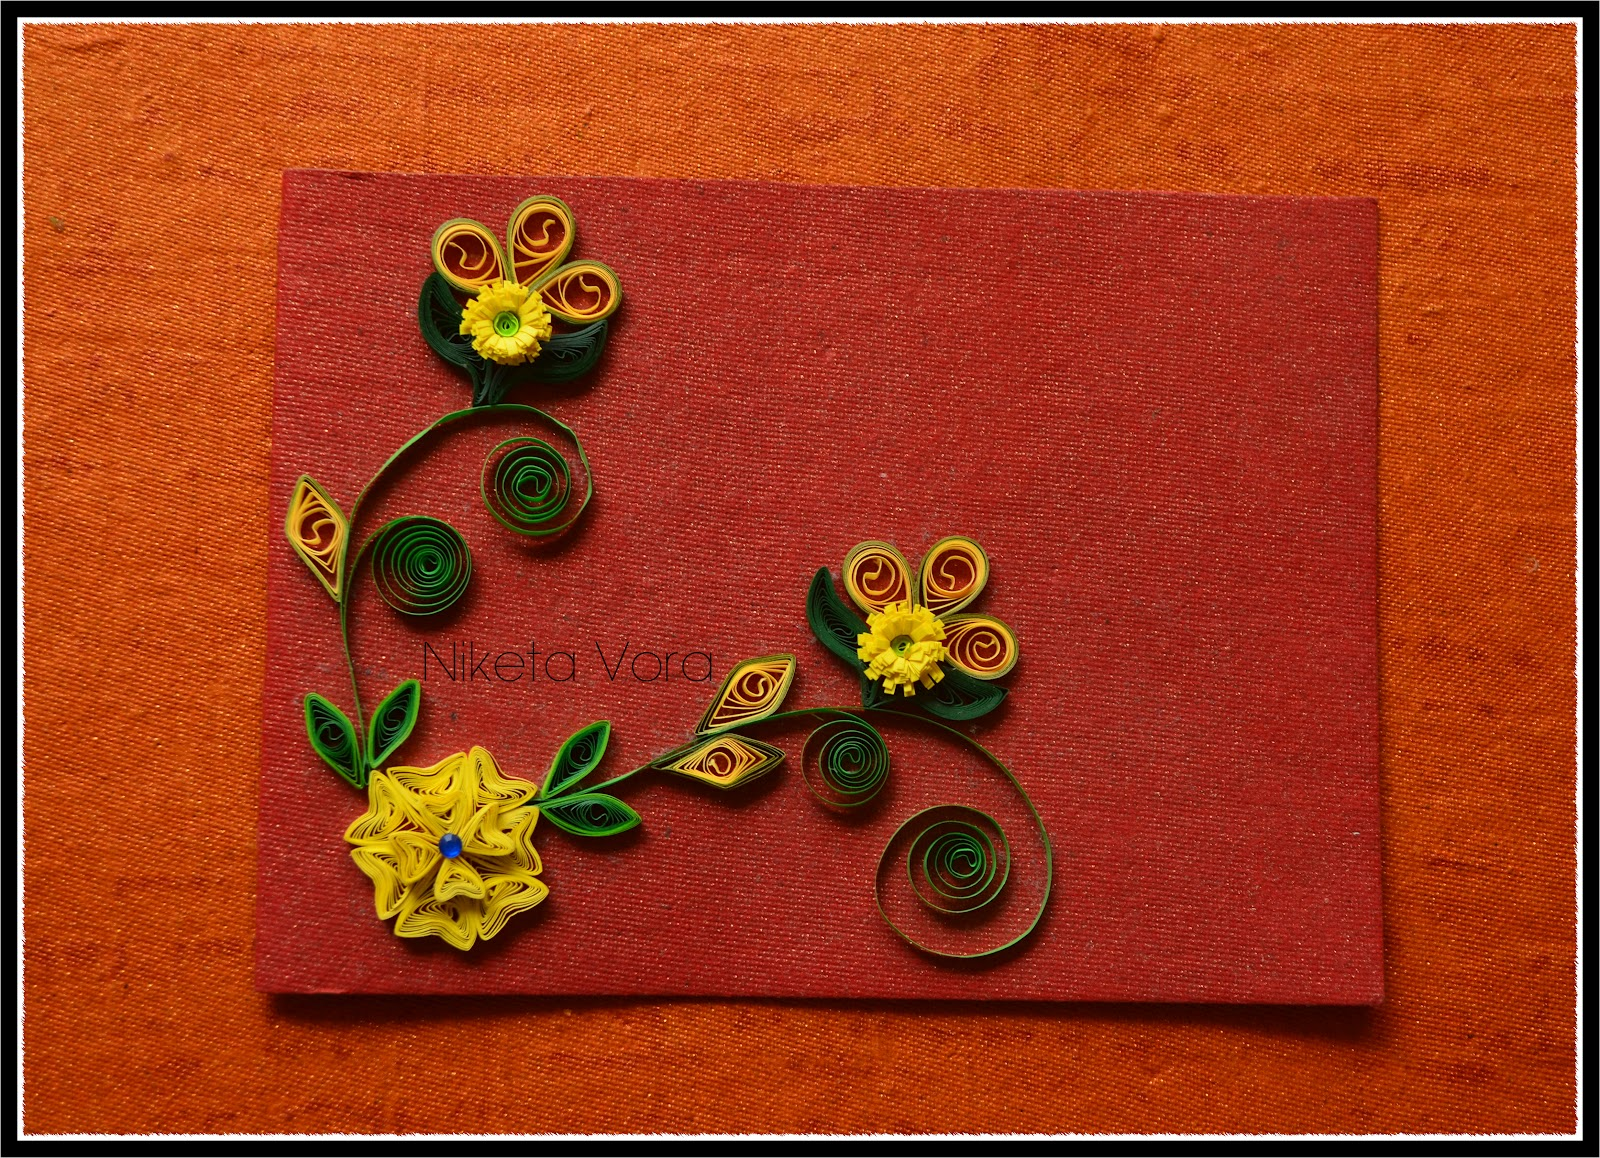 niketa's creative corner handmade quilled greeting card